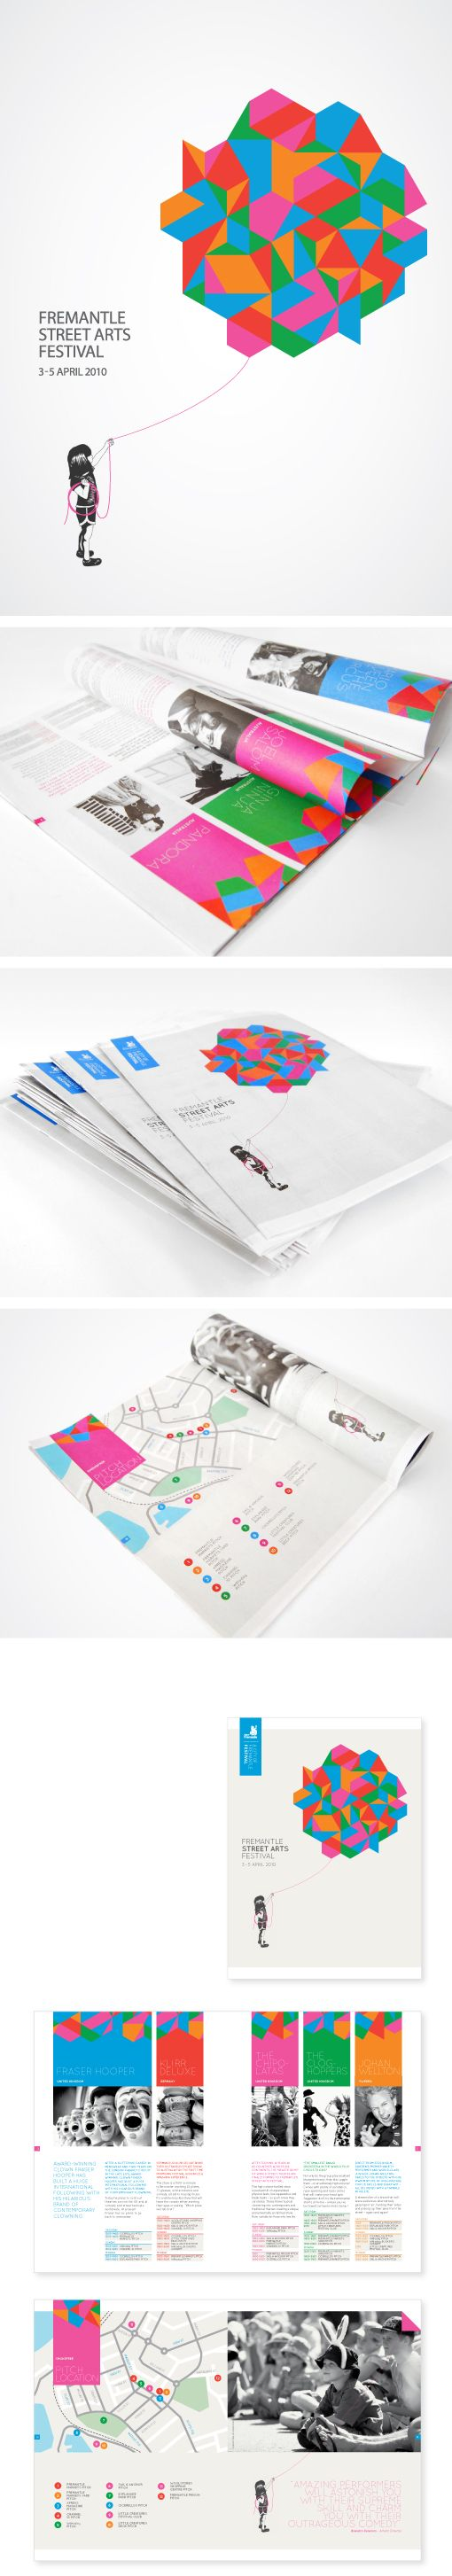 City of Fremantle Street Arts Festival by Nude Design Studio , via Behance